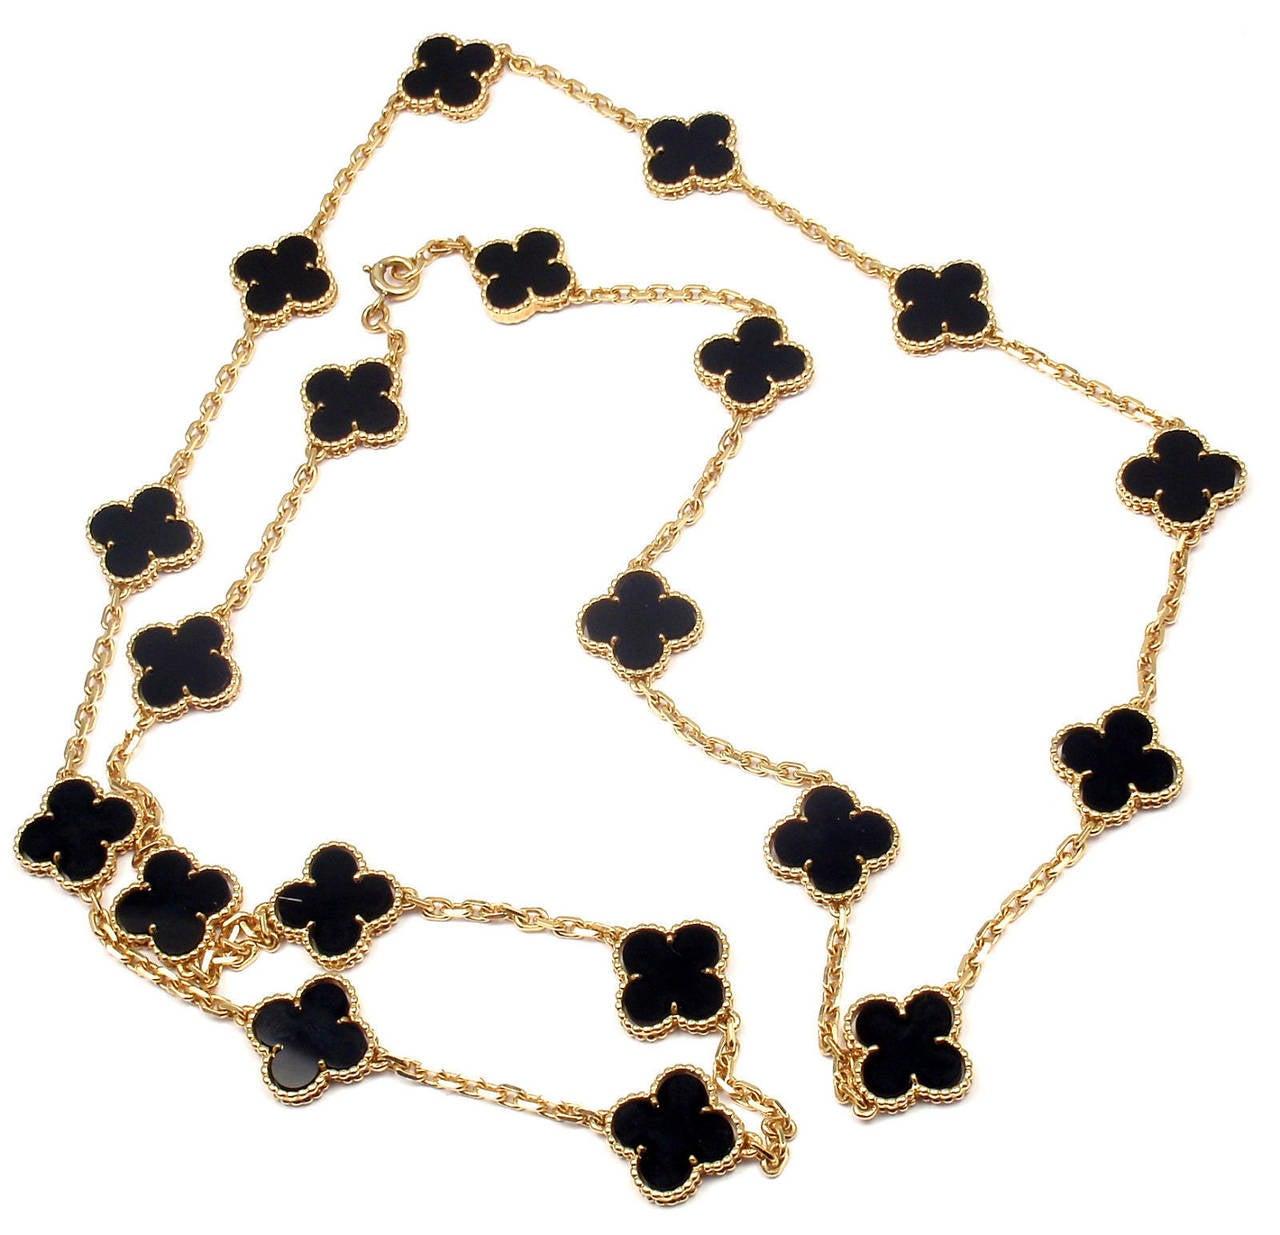 Van Cleef & Arpels Vintage Alhambra Twenty-Motif Black Onyx Gold Necklace 6